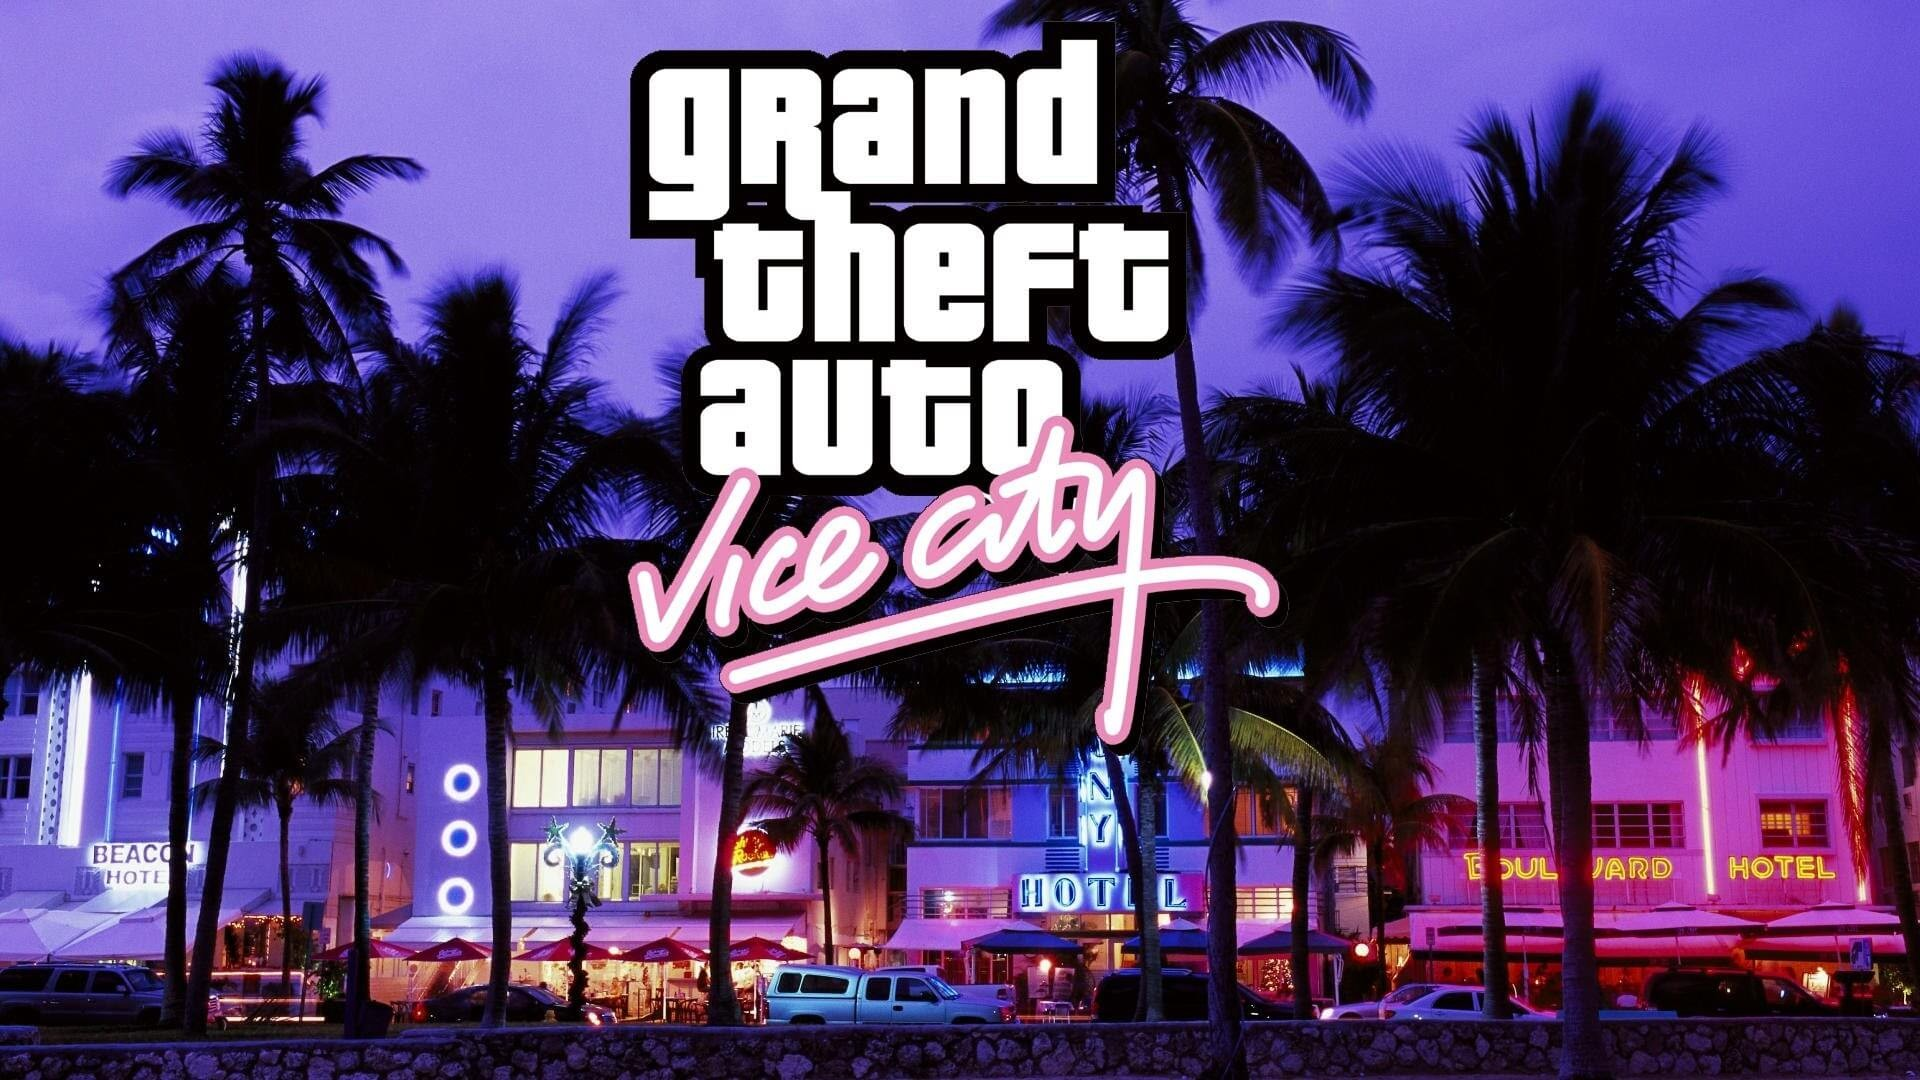 25 Grand Theft Auto Vice City Wallpapers On Wallpapersafari